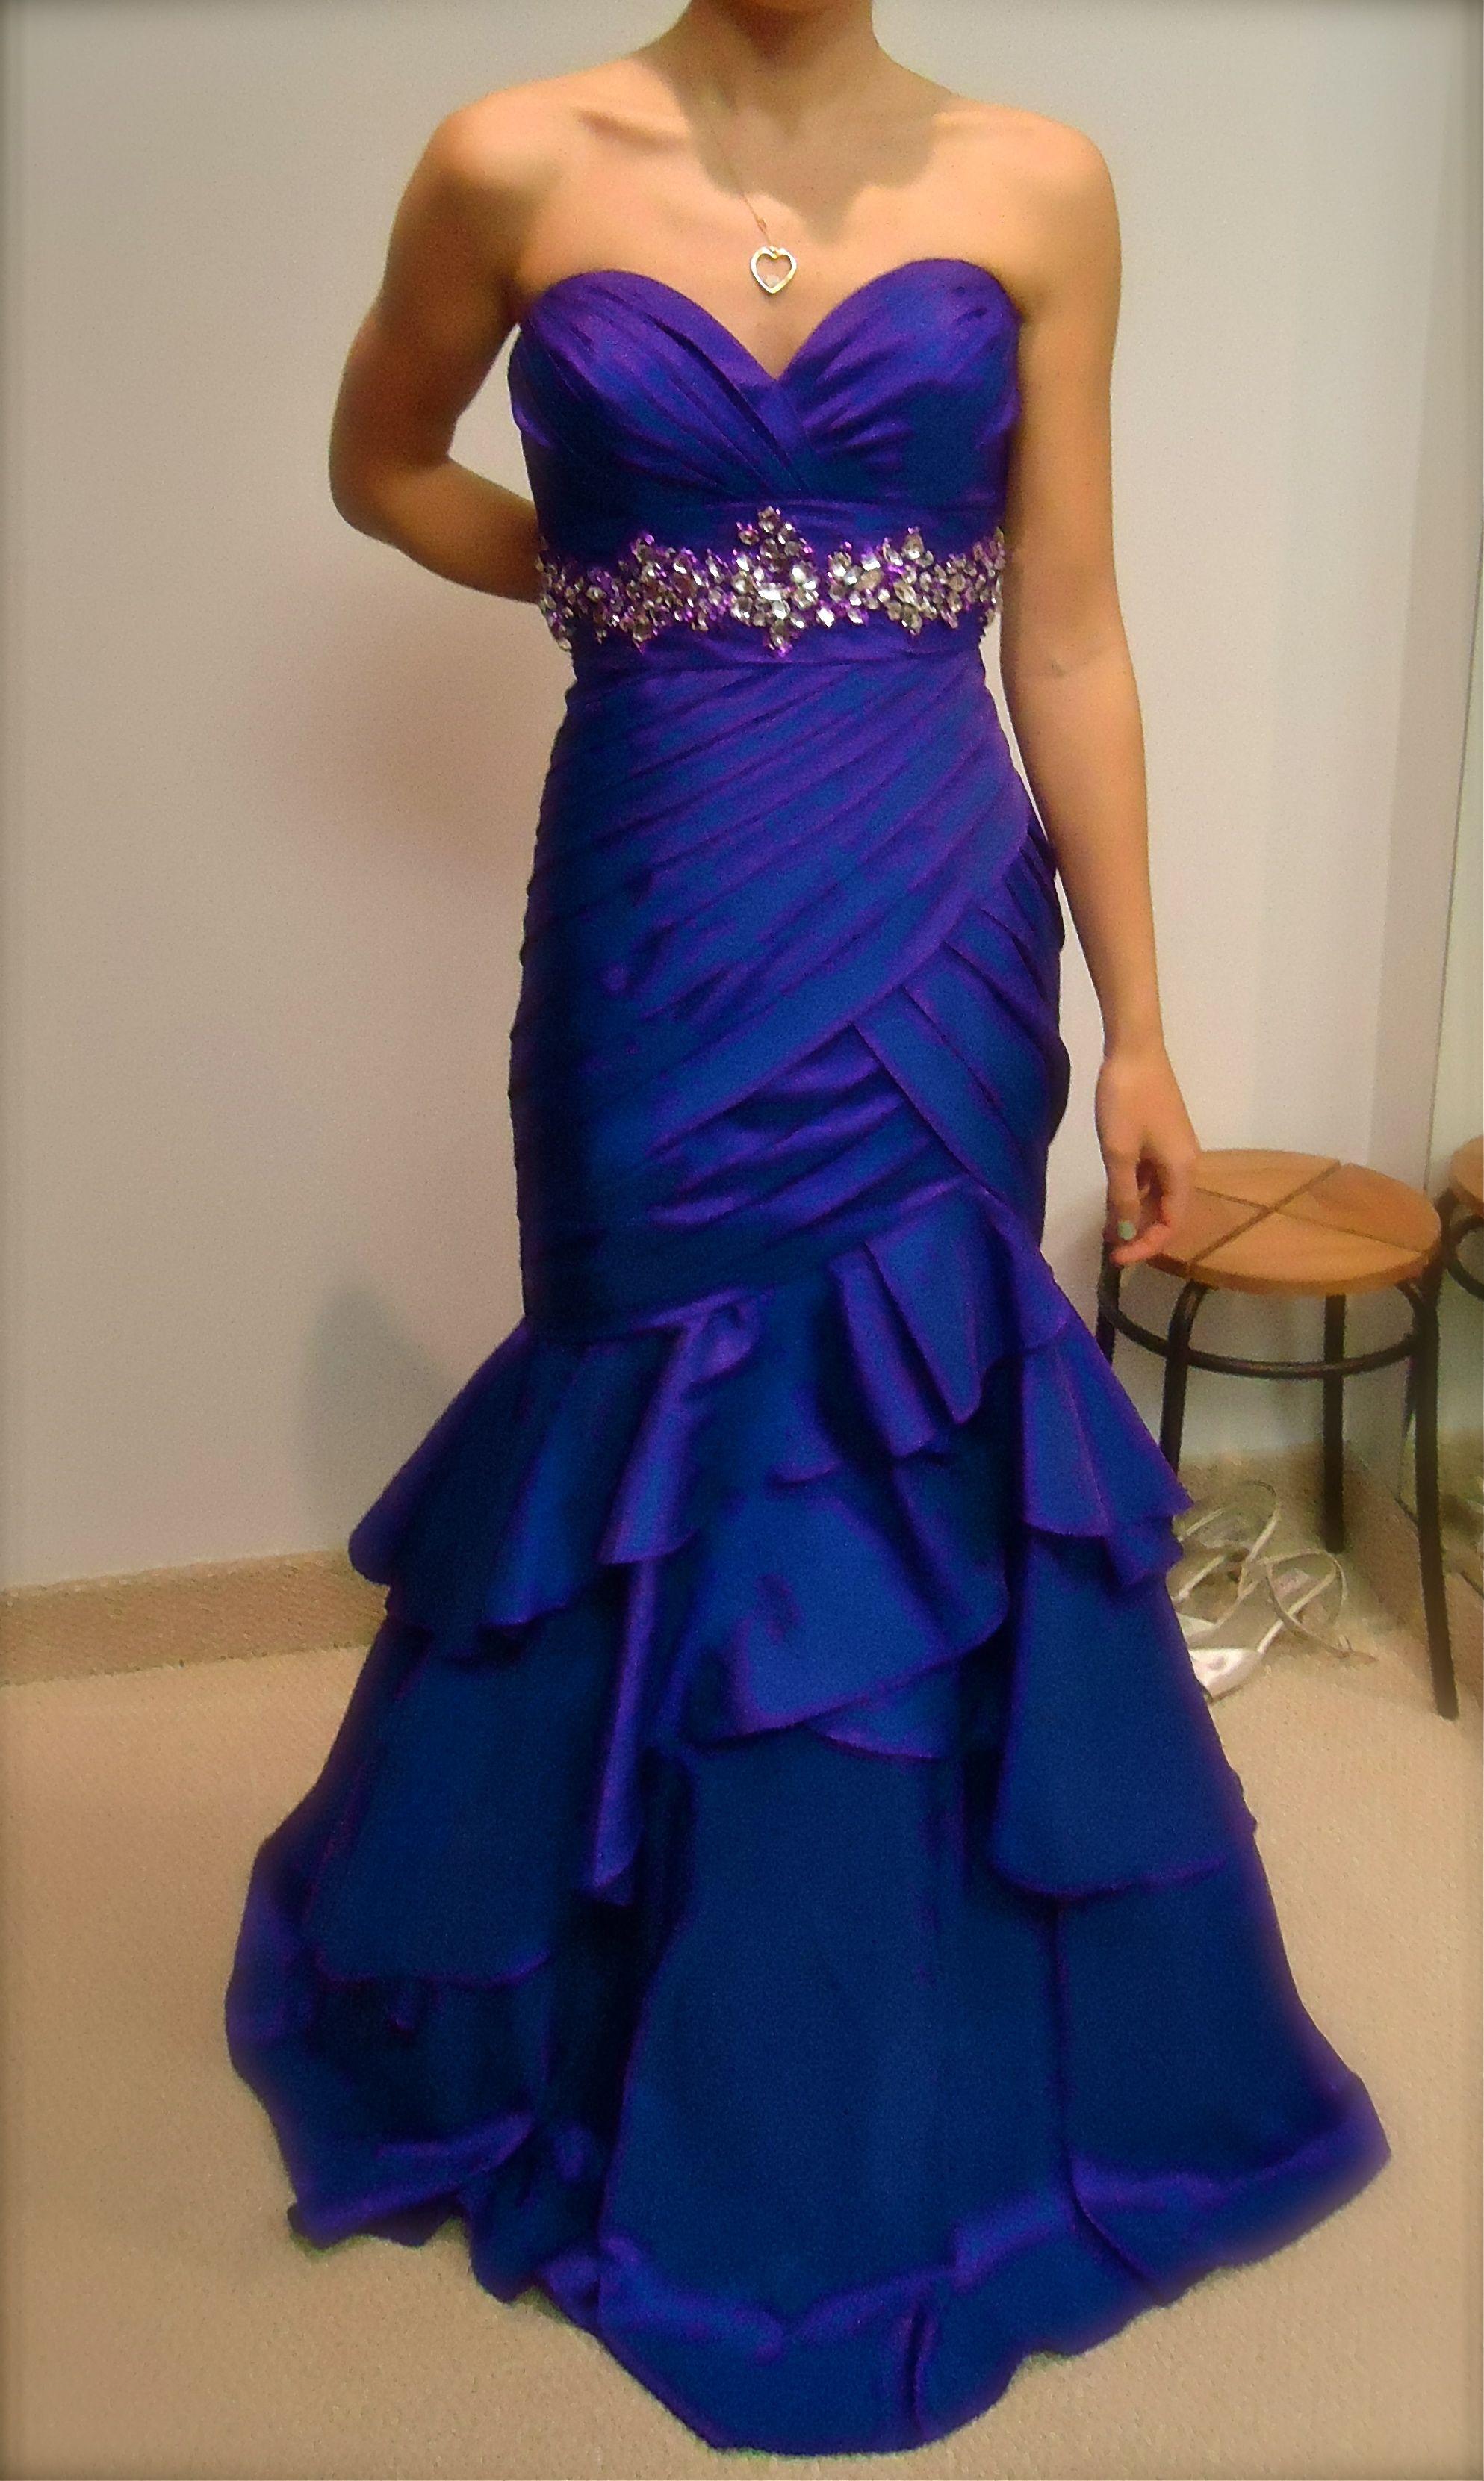 Purpleblue prom dress with beaded belt fashion costumes